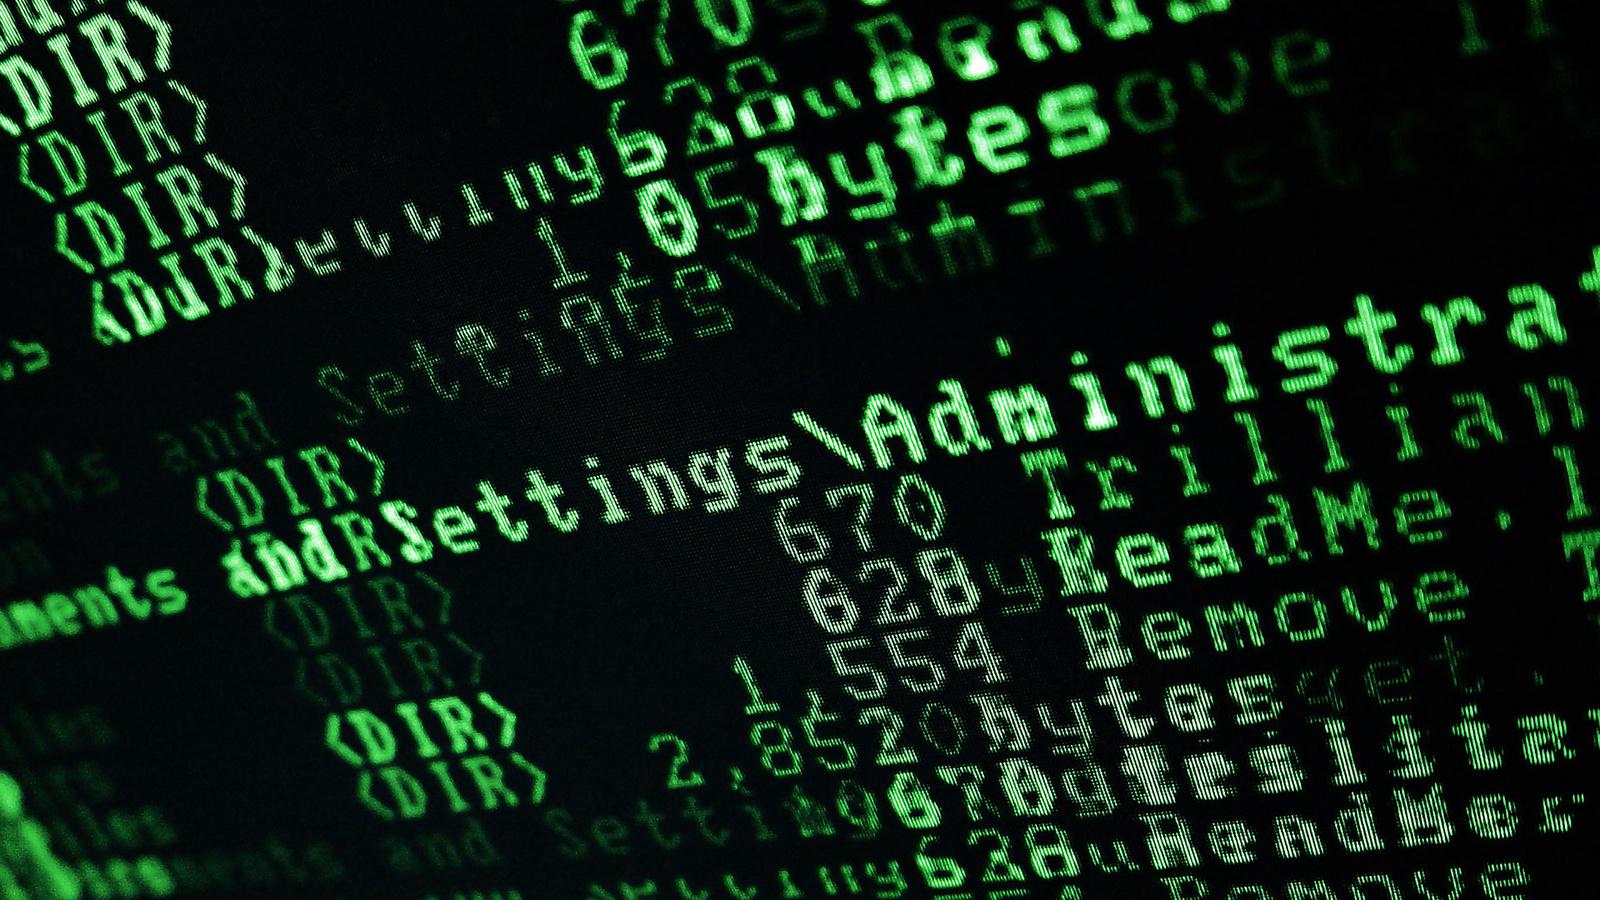 HD wallpapers code hacker Symbols Green System Hi tech photo 1600x900